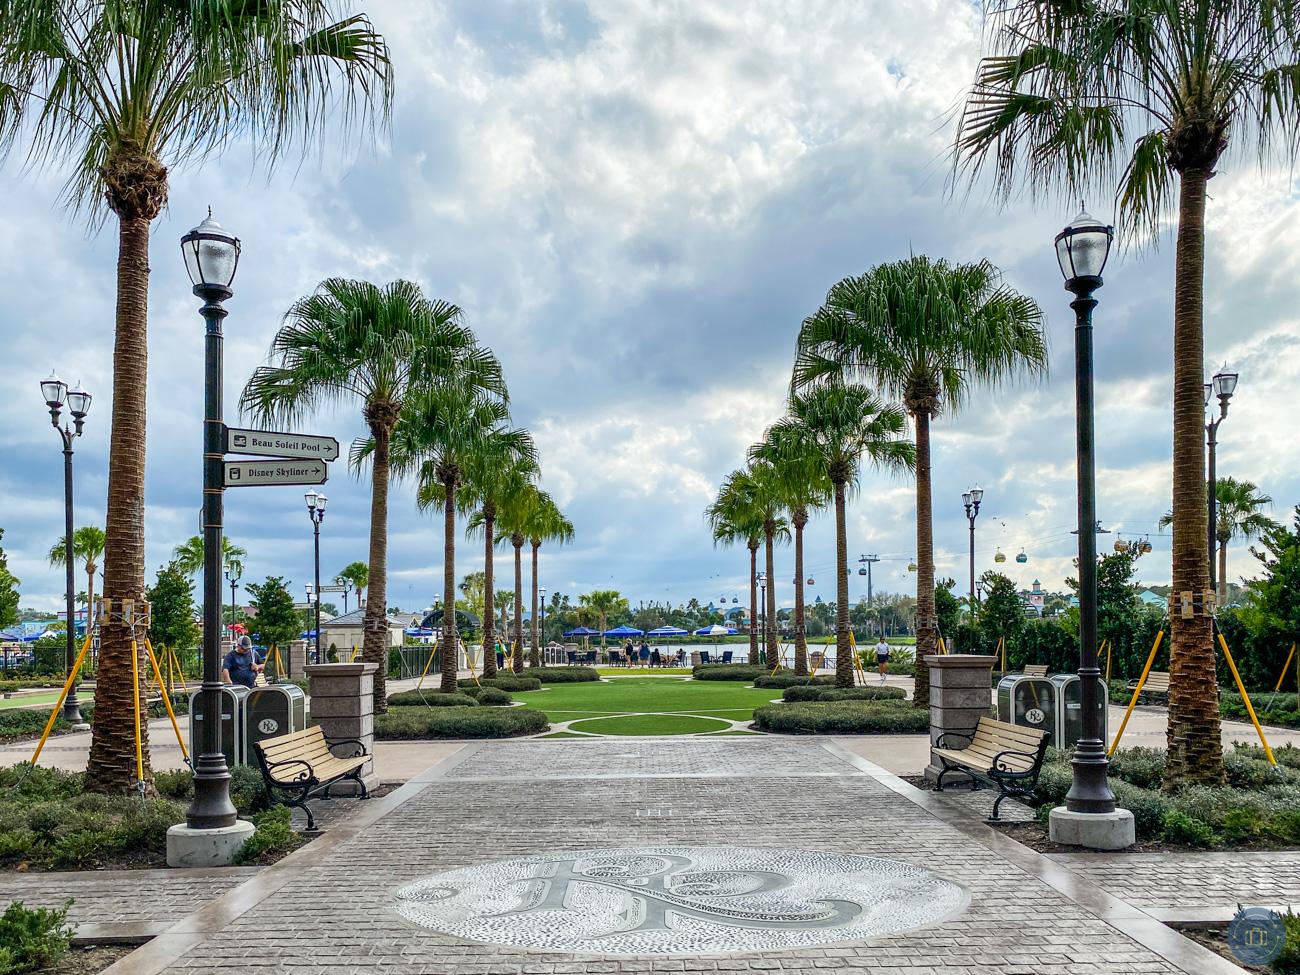 courtyard at the Disney World Riviera Resort